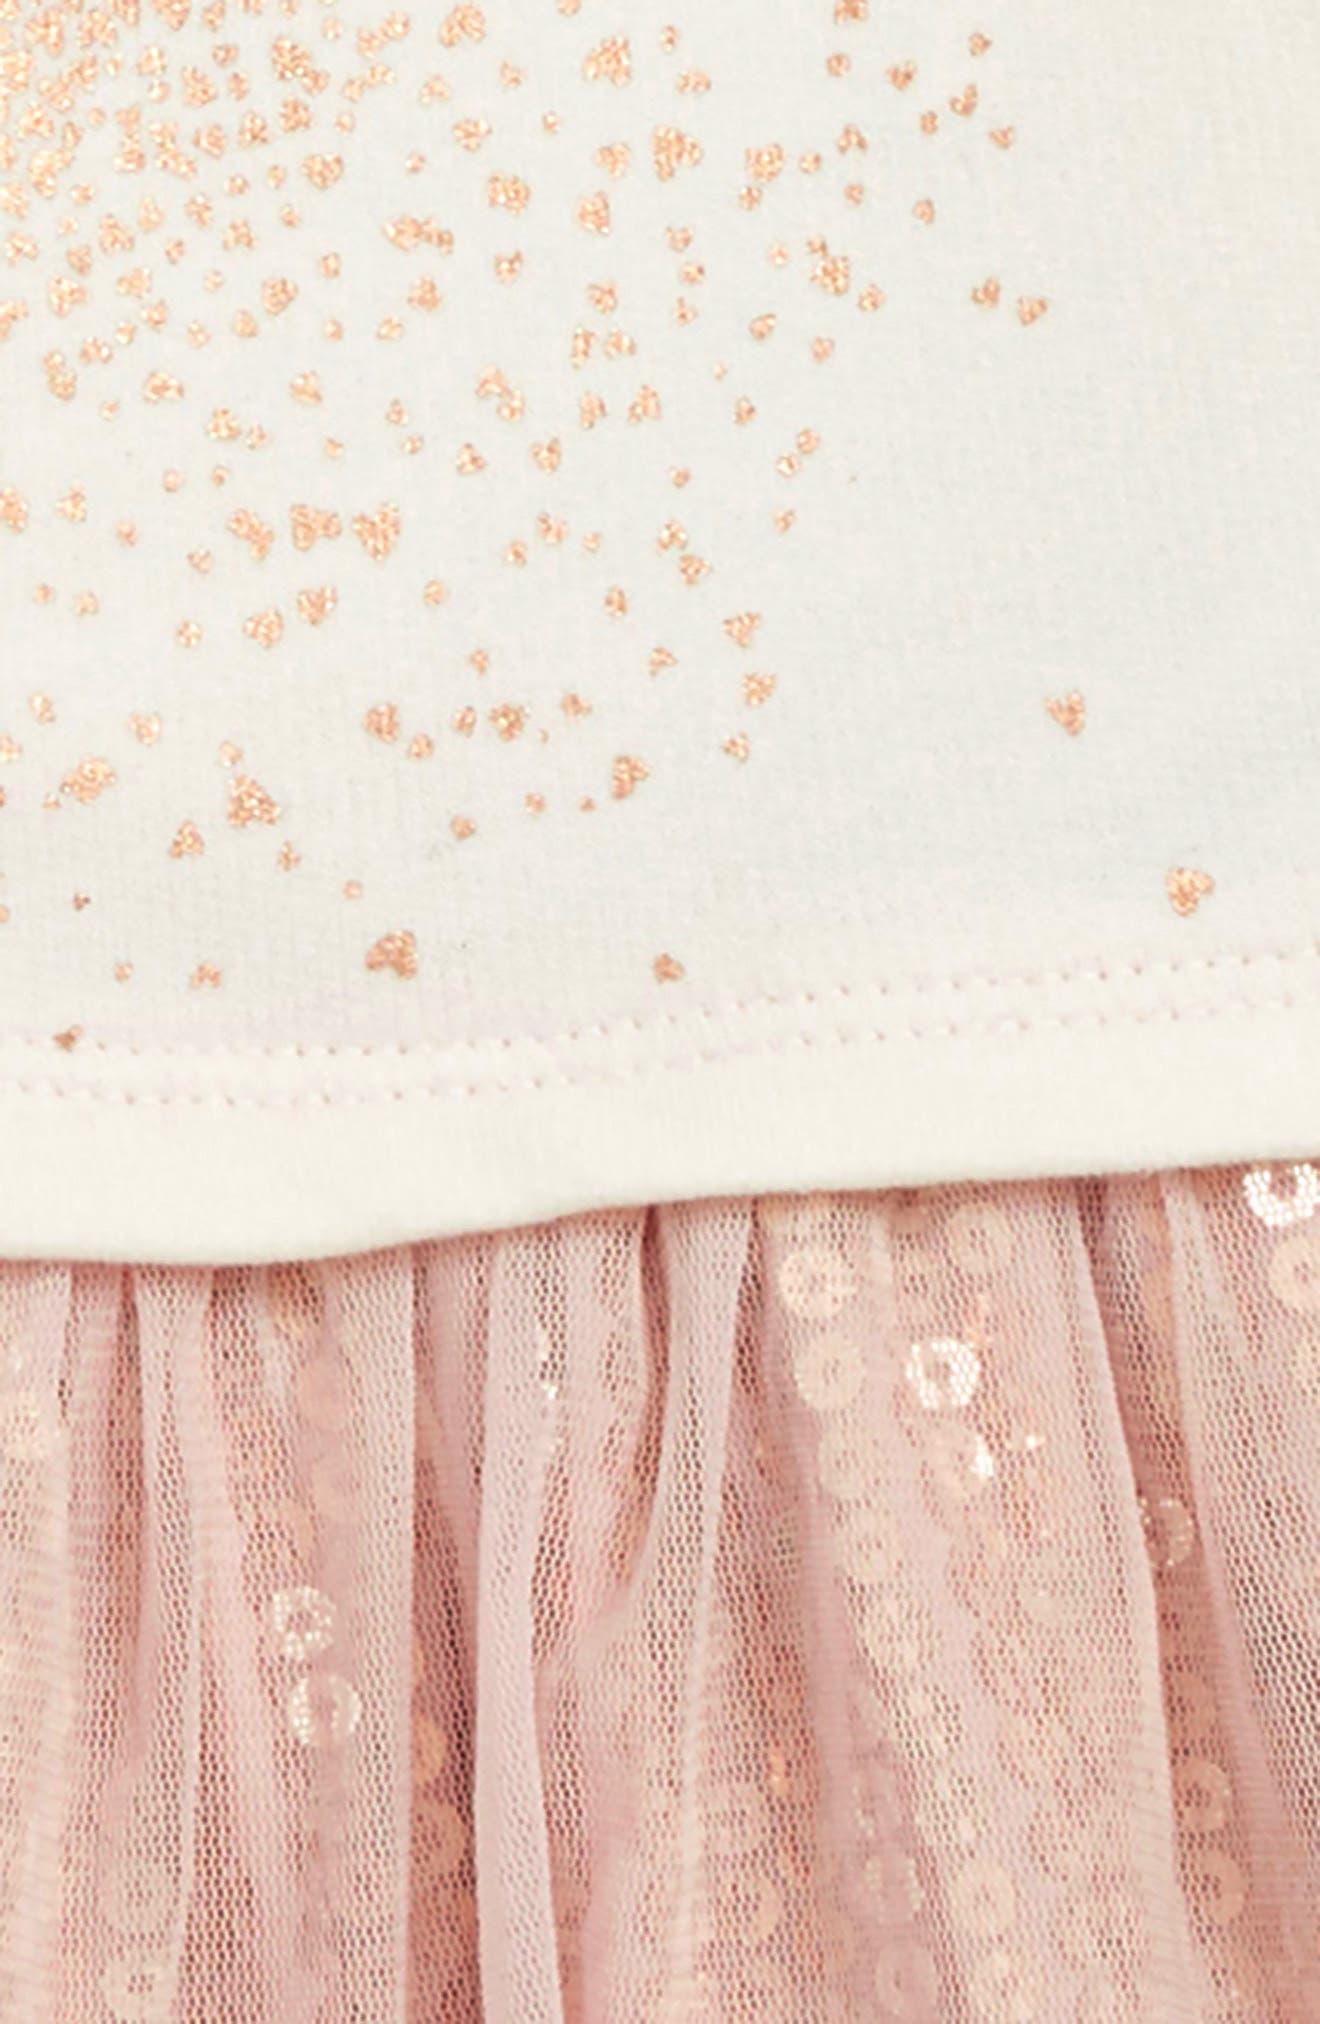 TUCKER + TATE,                             Sequin Tutu Dress,                             Alternate thumbnail 3, color,                             IVORY EGRET- PINK HEART